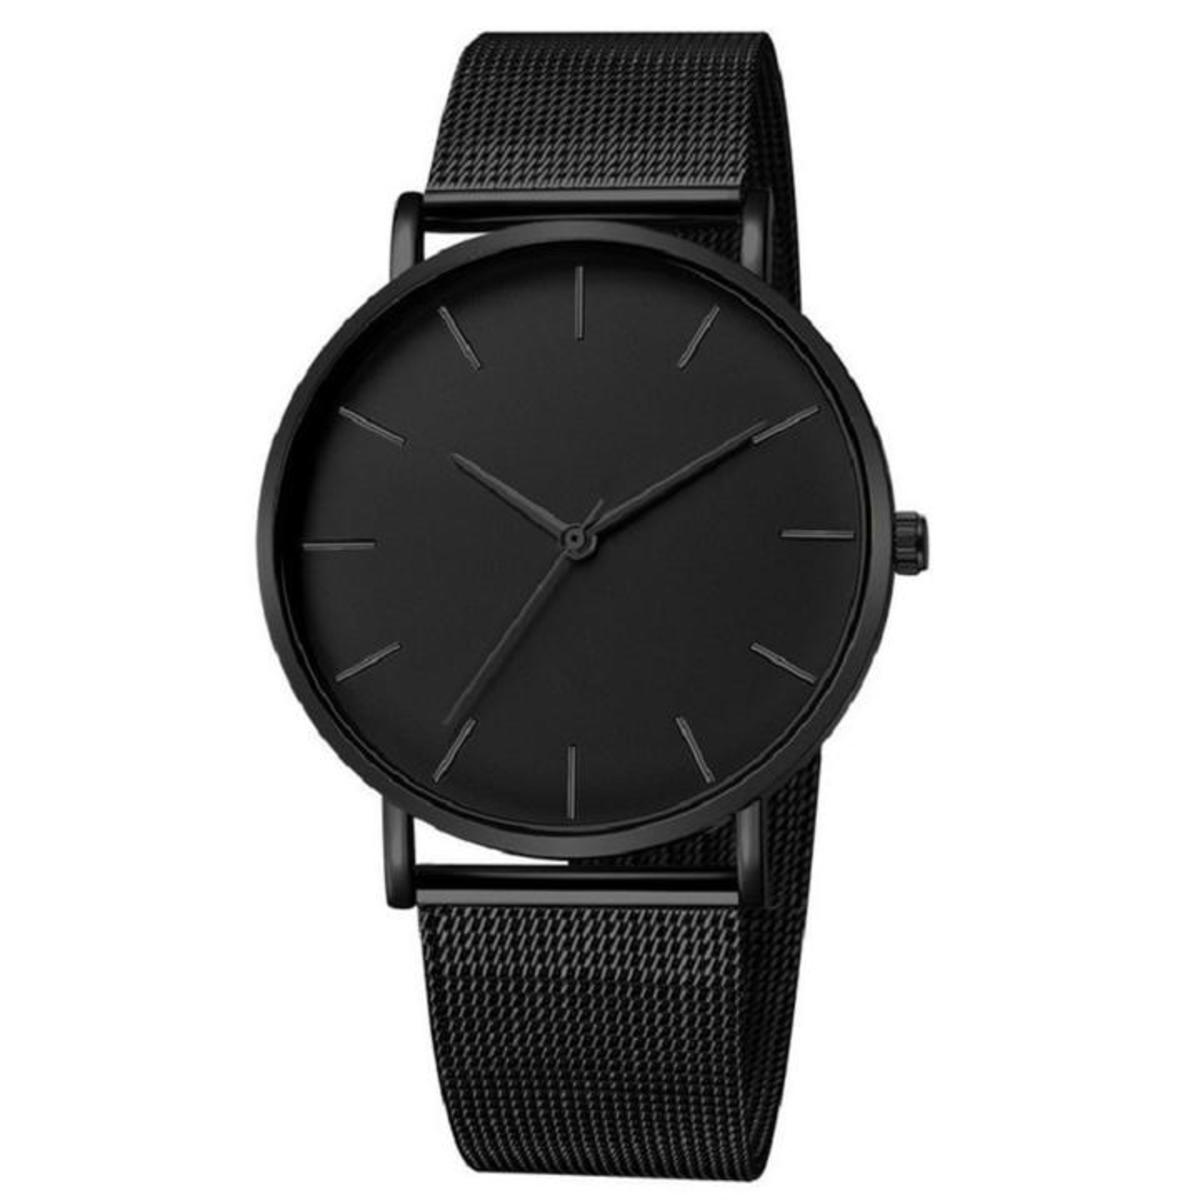 Minimal, elegant black watch